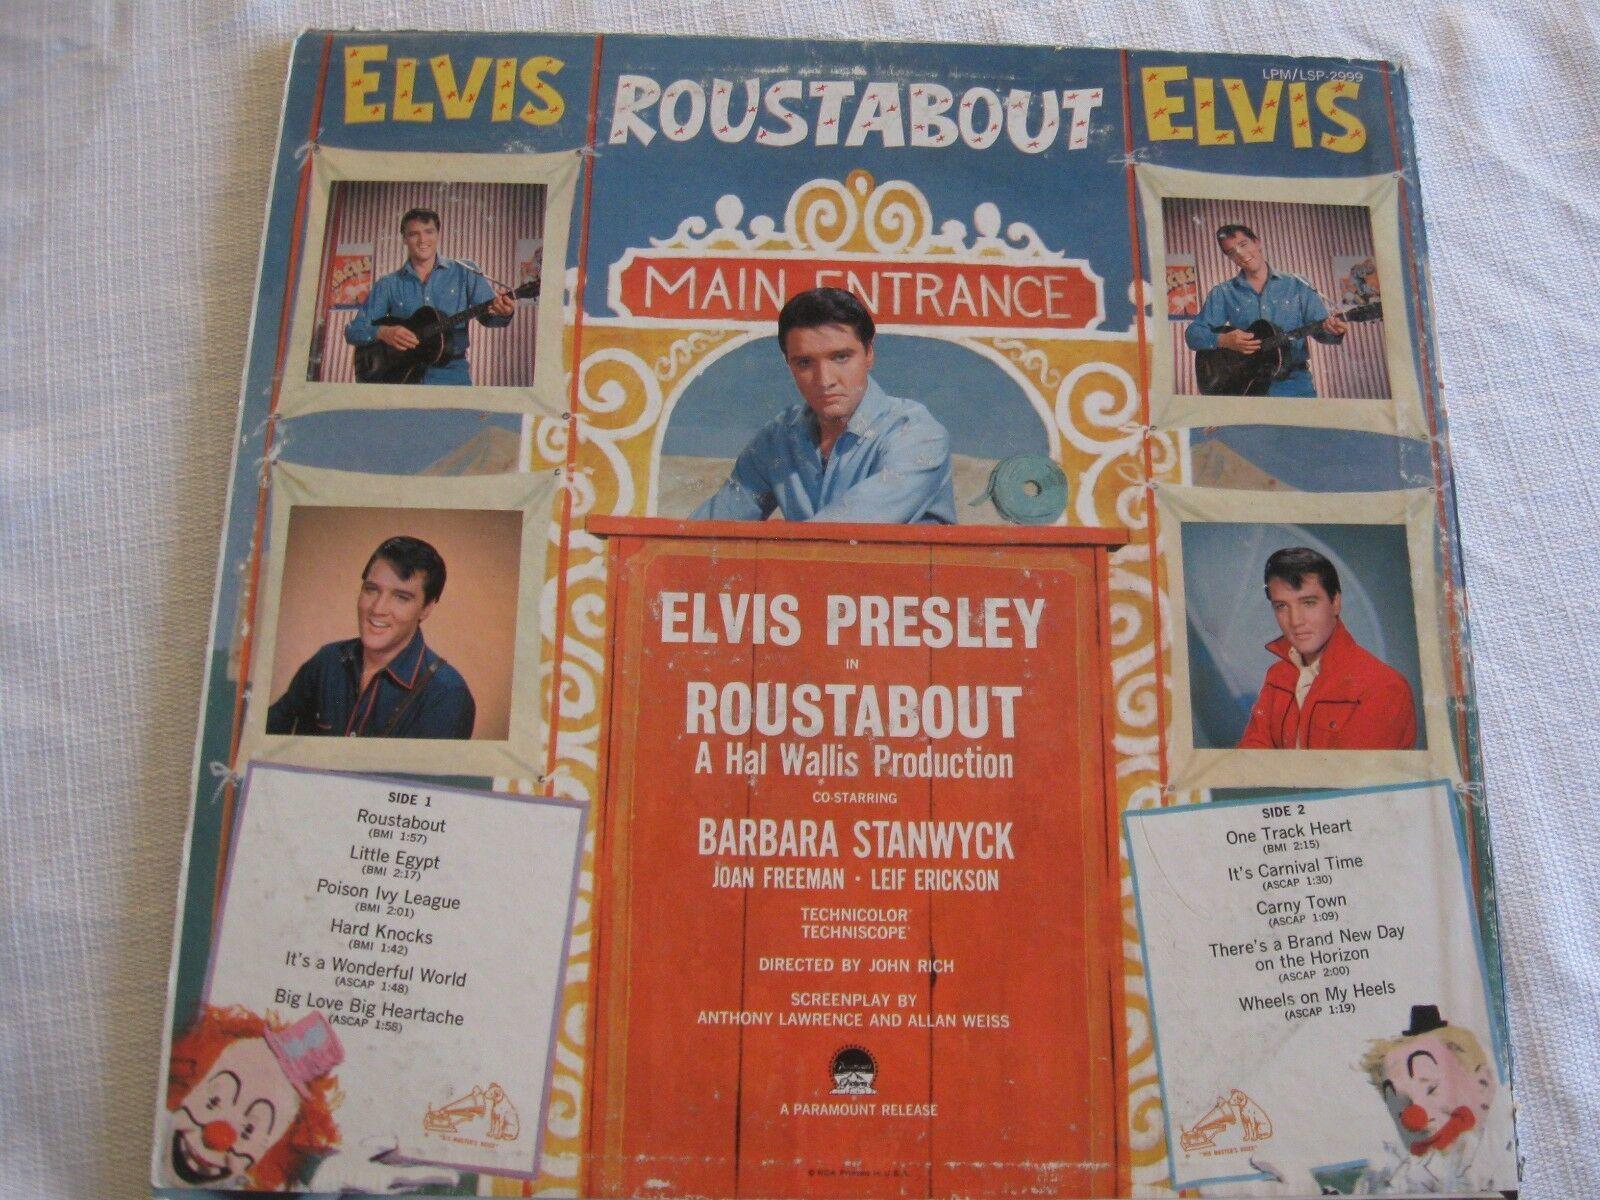 Elvis Presley Roustabout RCA LPM-2999 Mono Vinyl Record LP image 2